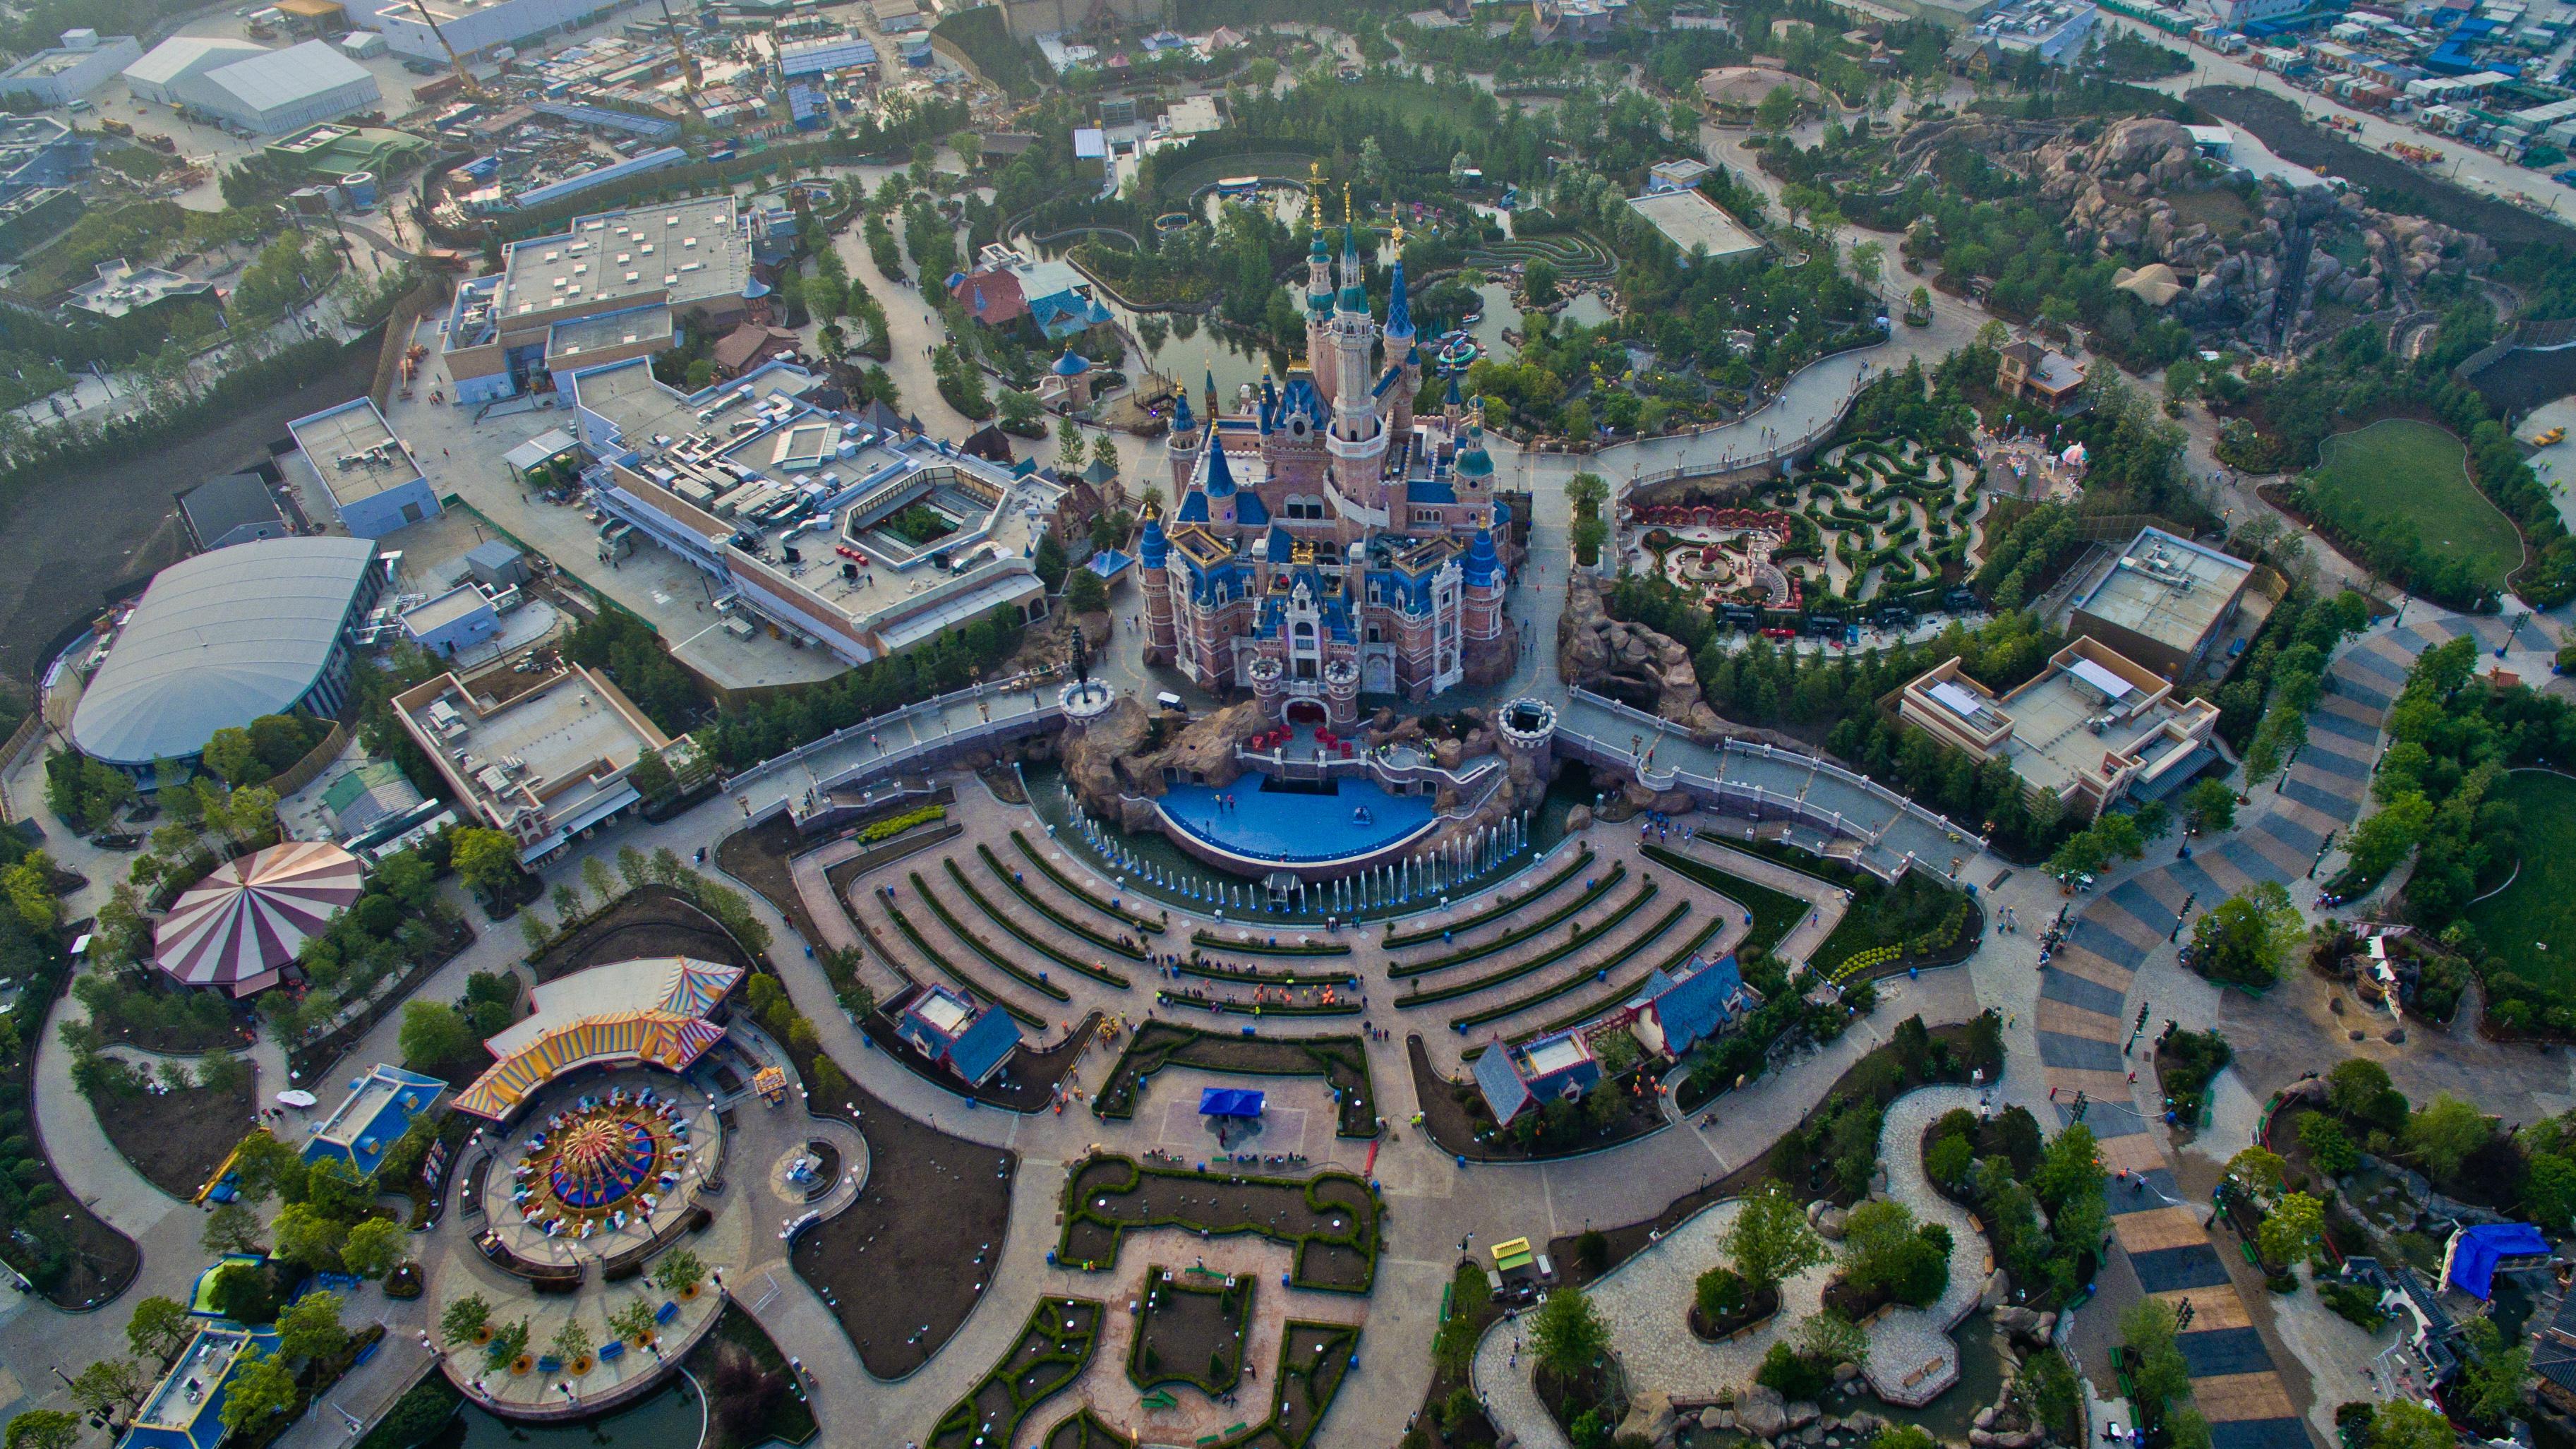 Review of Shanghai Disneyland: What's the verdict? | CNN Travel on singapore disneyland map, los angeles disneyland map, dollywood map, knott's berry farm map, hersheypark map, disneyland brazil map, disneyland area map, hongkong disneyland map, vintage disneyland map, hong kong map, disneyland ca adventure map, china disneyland map, disneyland park map, magic kingdom map, disneyland concept map, universal studios singapore map, disneyland california map, disneyland anaheim map, disneyland paris map, ferrari world abu dhabi map,